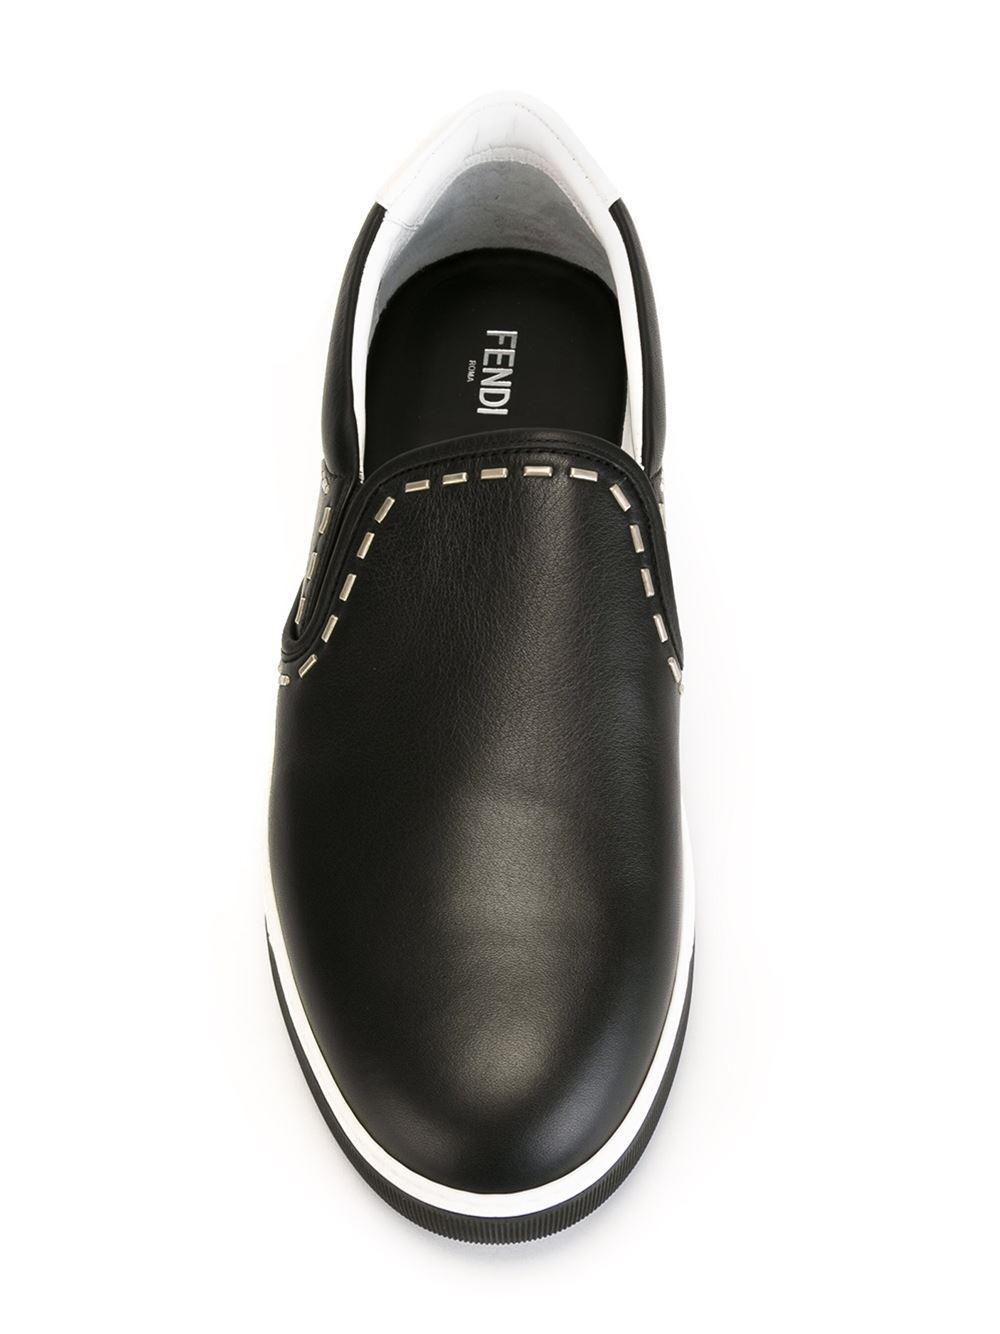 metallic trim oxford shoes - Black Fendi OiviElLsng